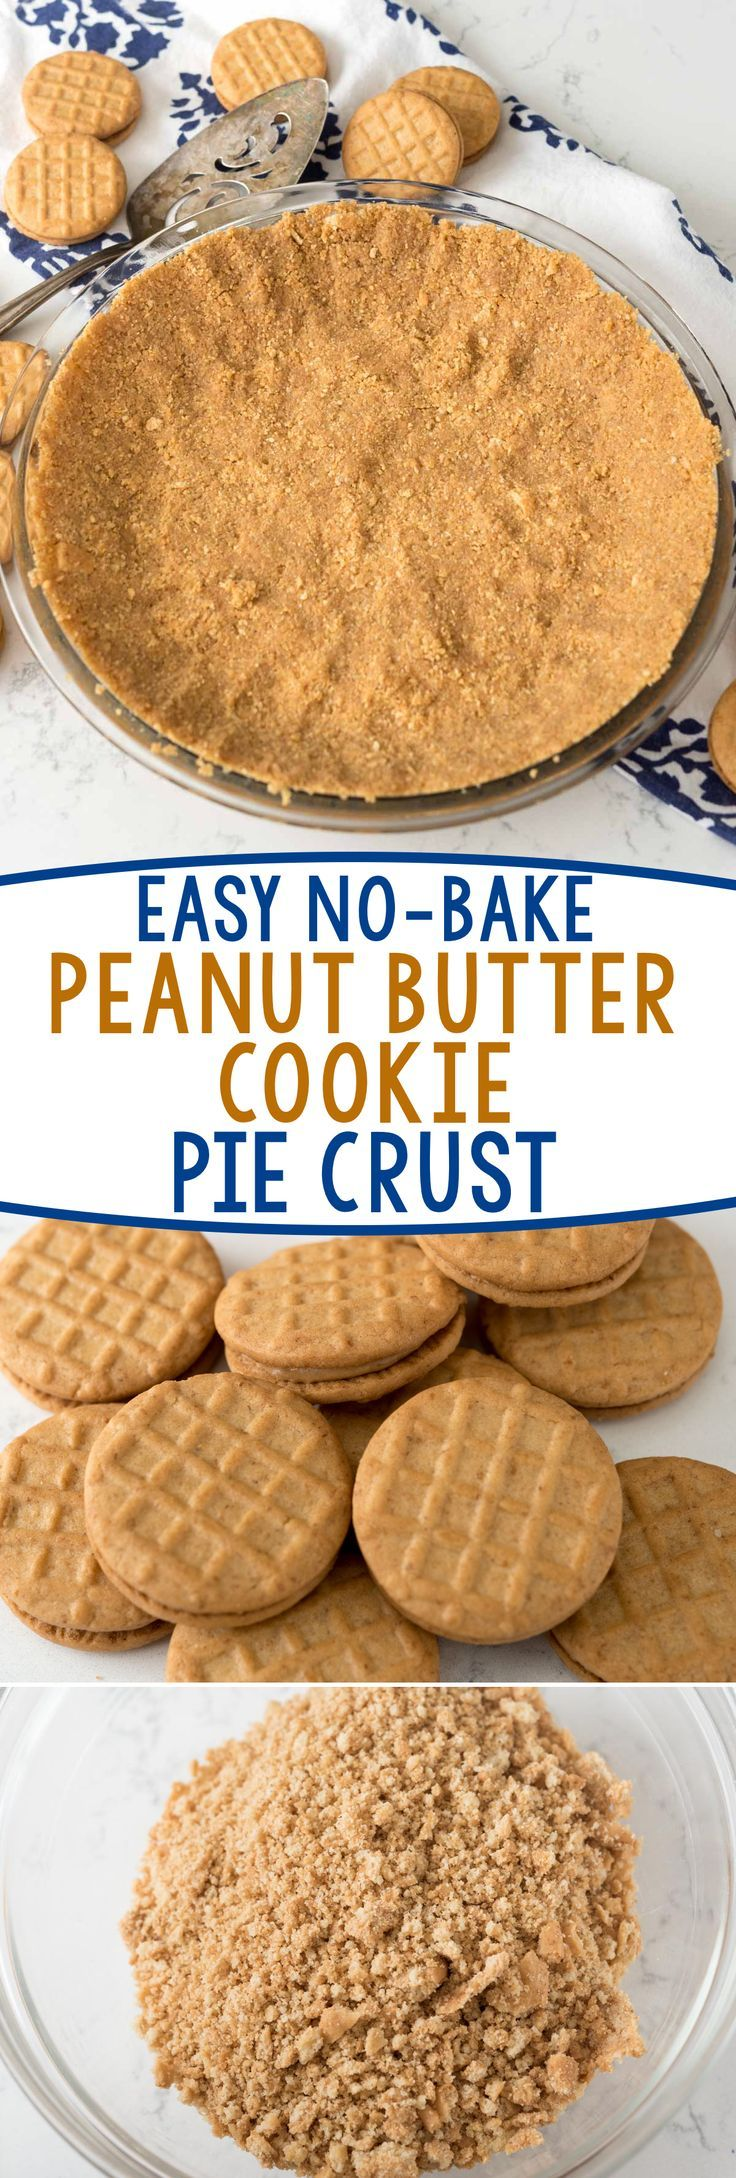 25+ best ideas about Tart crust recipe on Pinterest ...